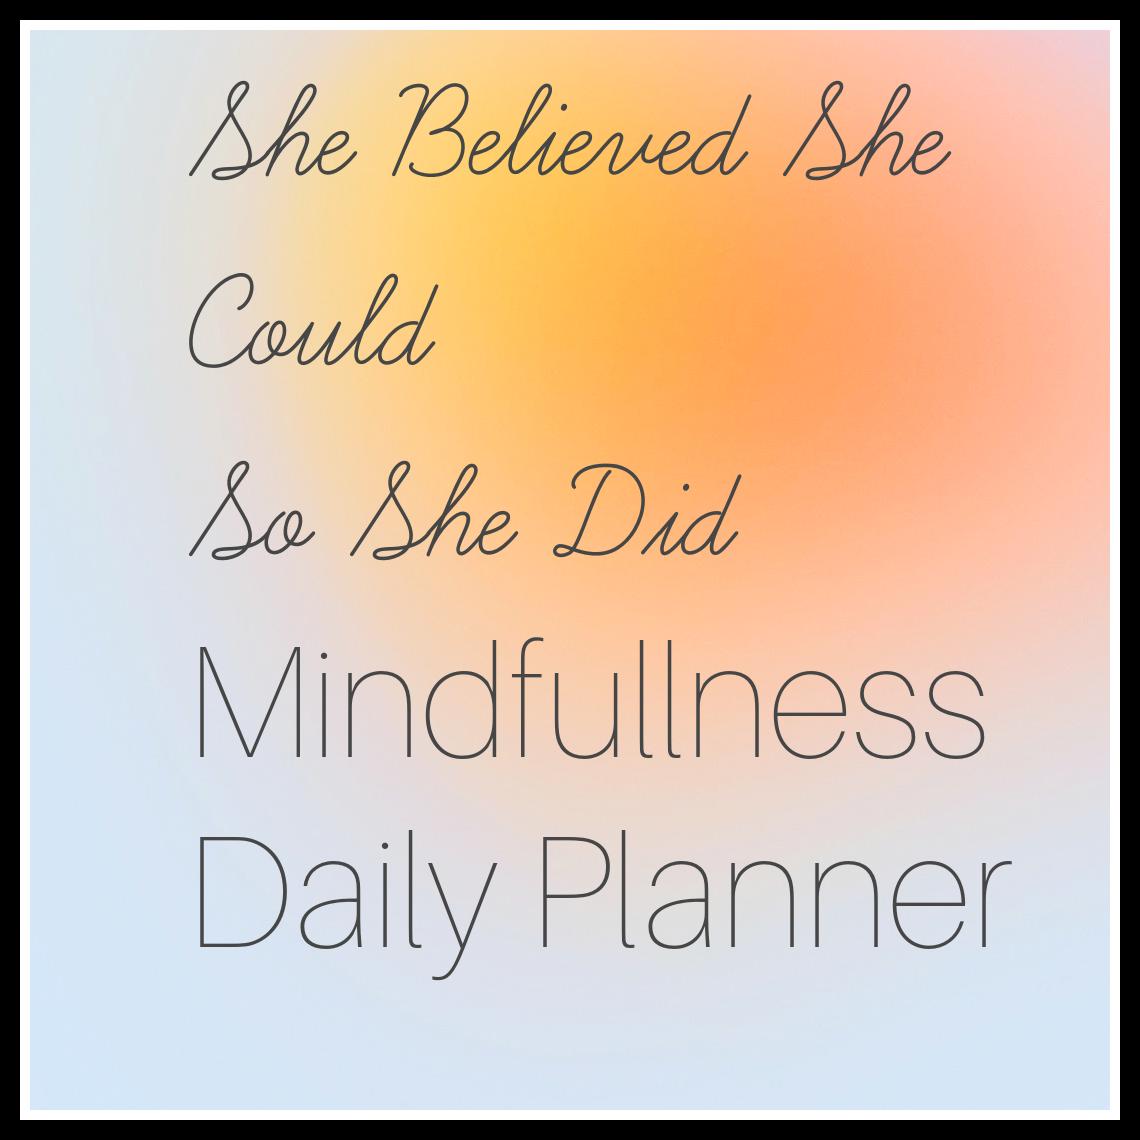 planner-mindfulness-positive-thinking-organization-wellbeing